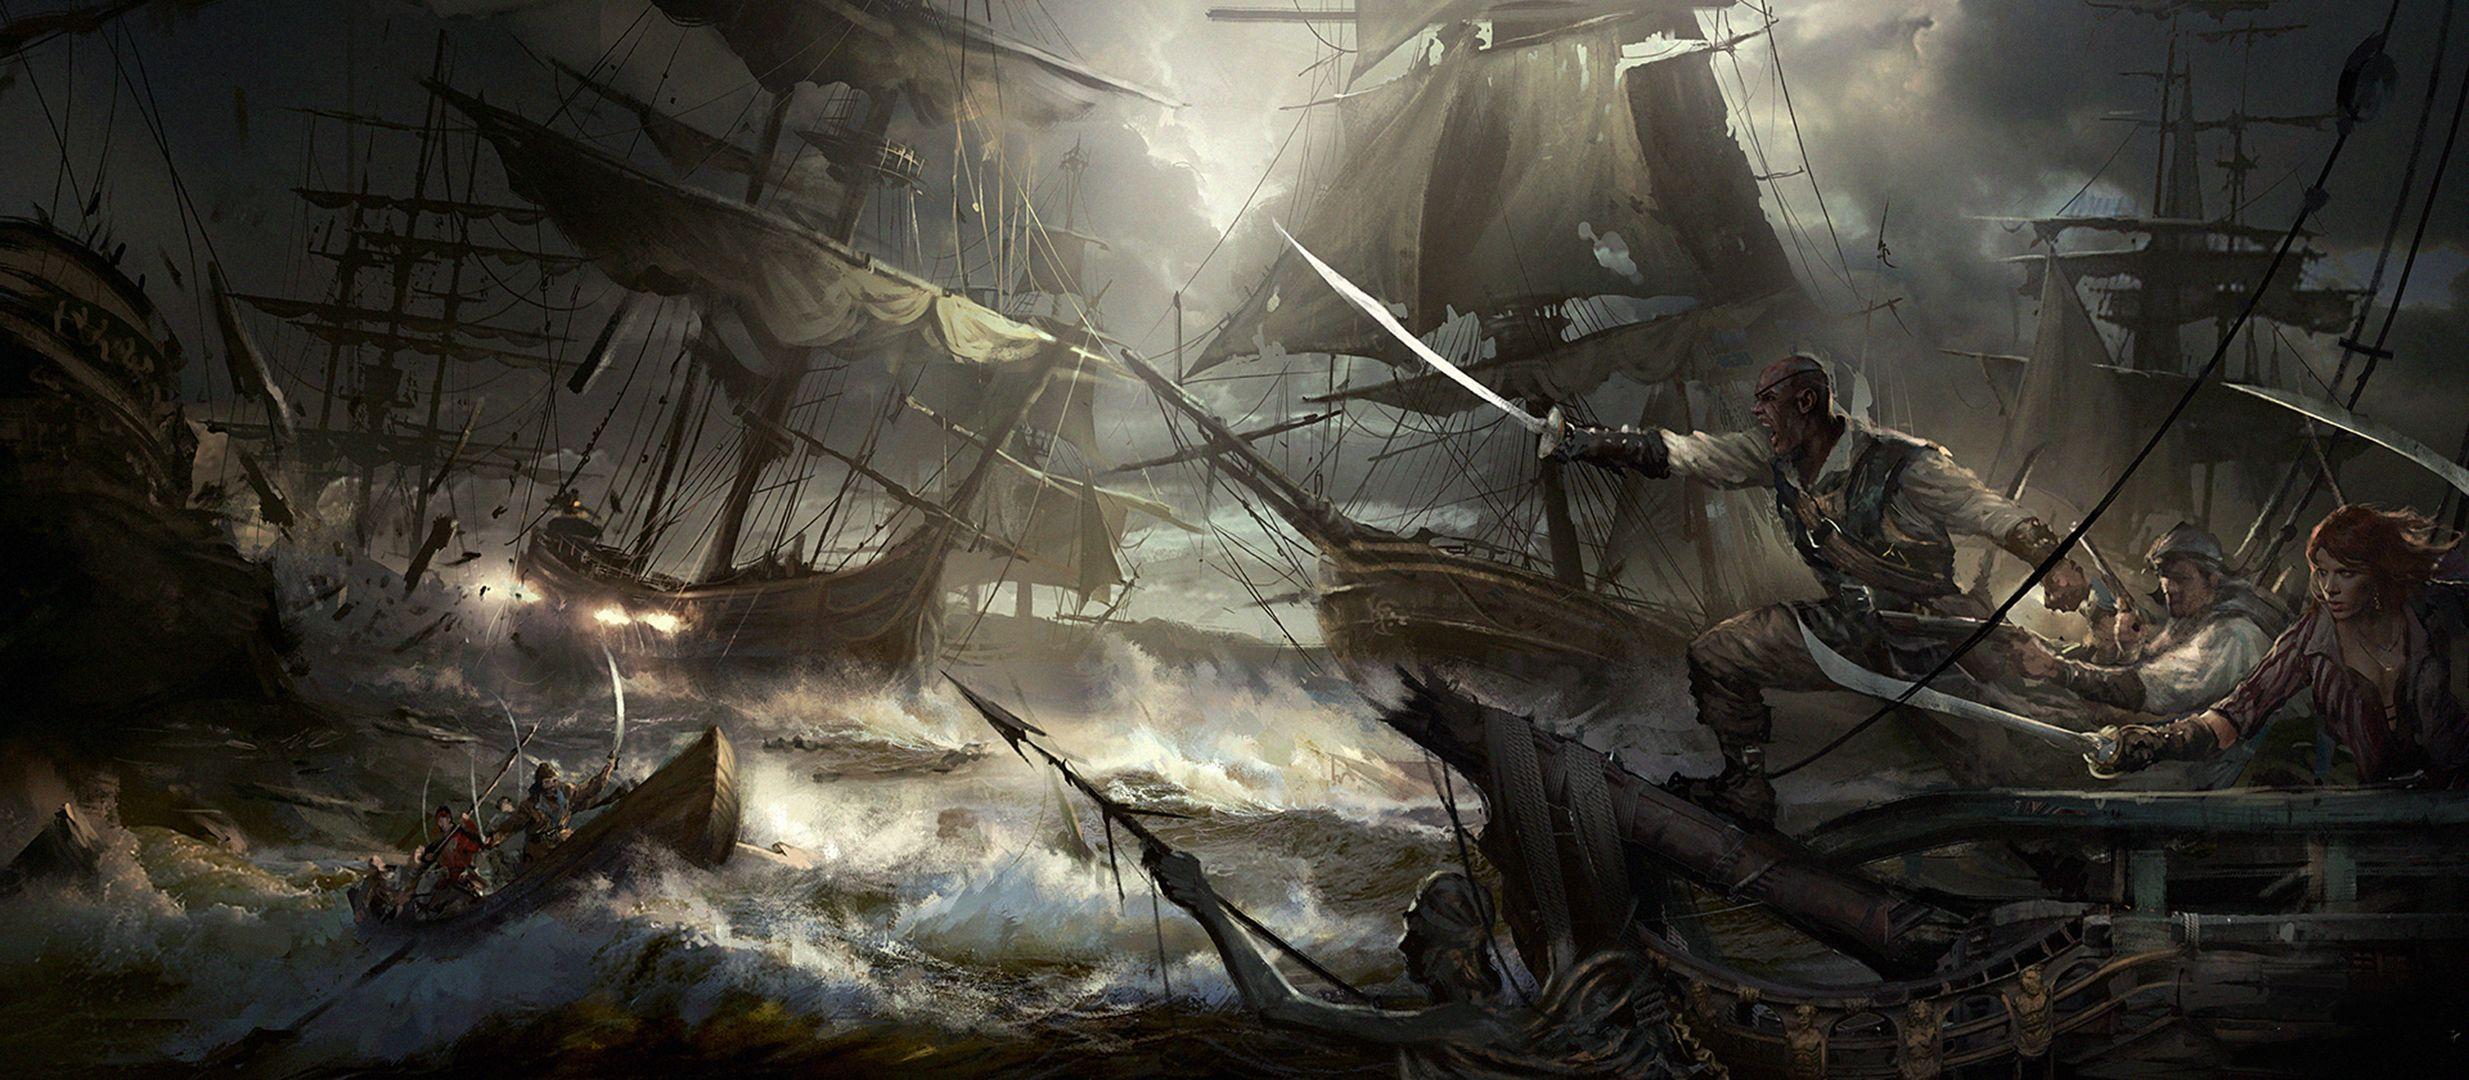 Fantasy Pirate Battle Sword Ship Fantasy Wallpaper | Pirates